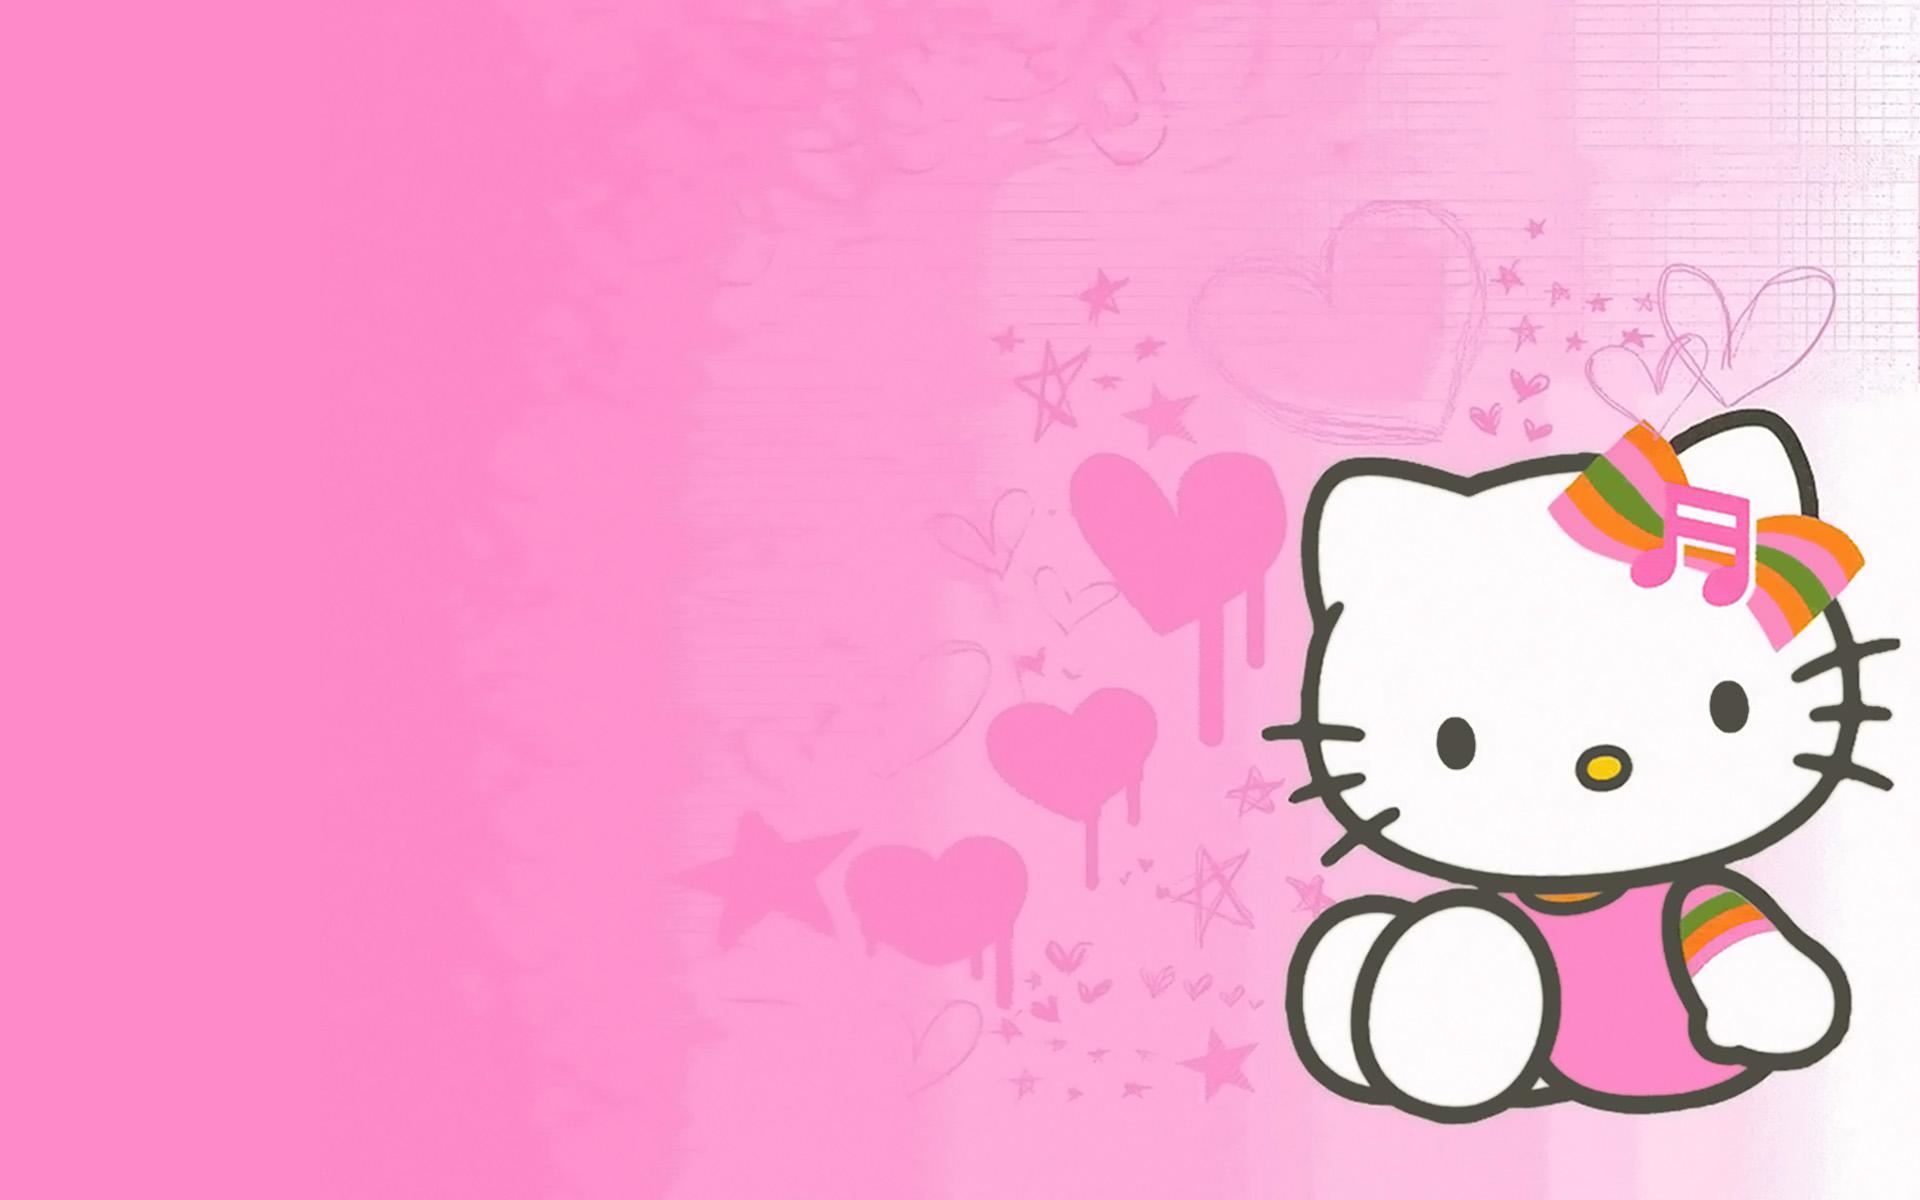 fileswordpresscom201009hello kitty valentine 1920x1200jpg 1920x1200